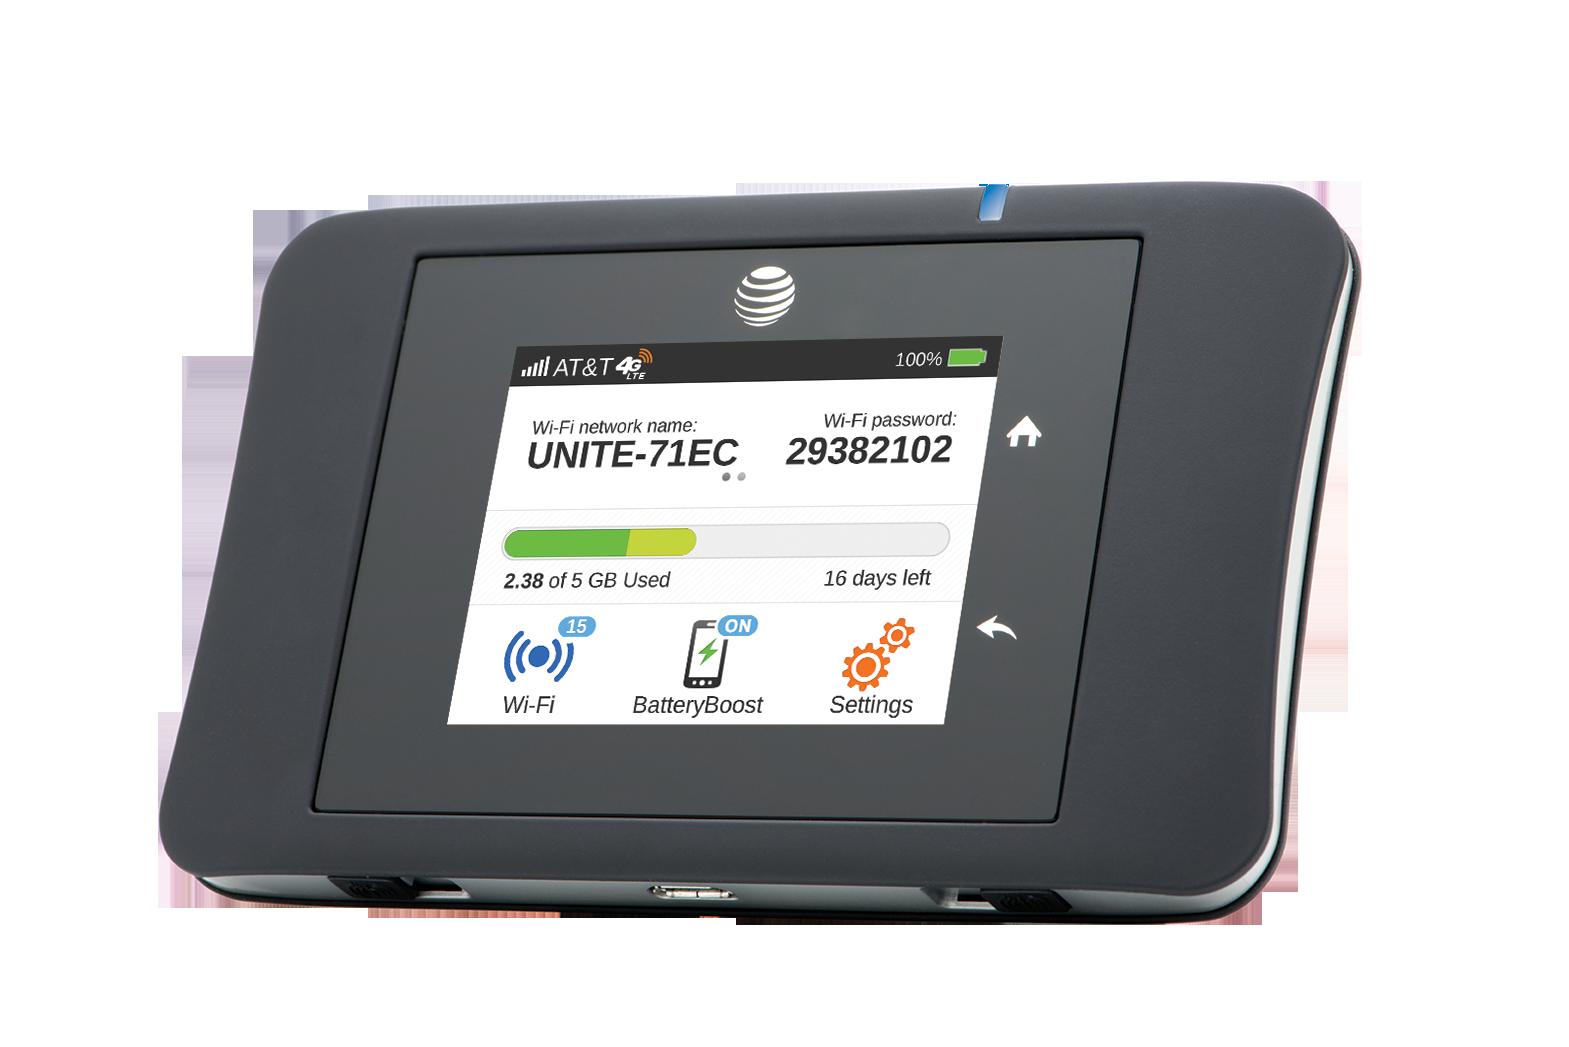 Digital Lifestyle: AT&T Unite Pro Wifi Hotspot by NETGEAR